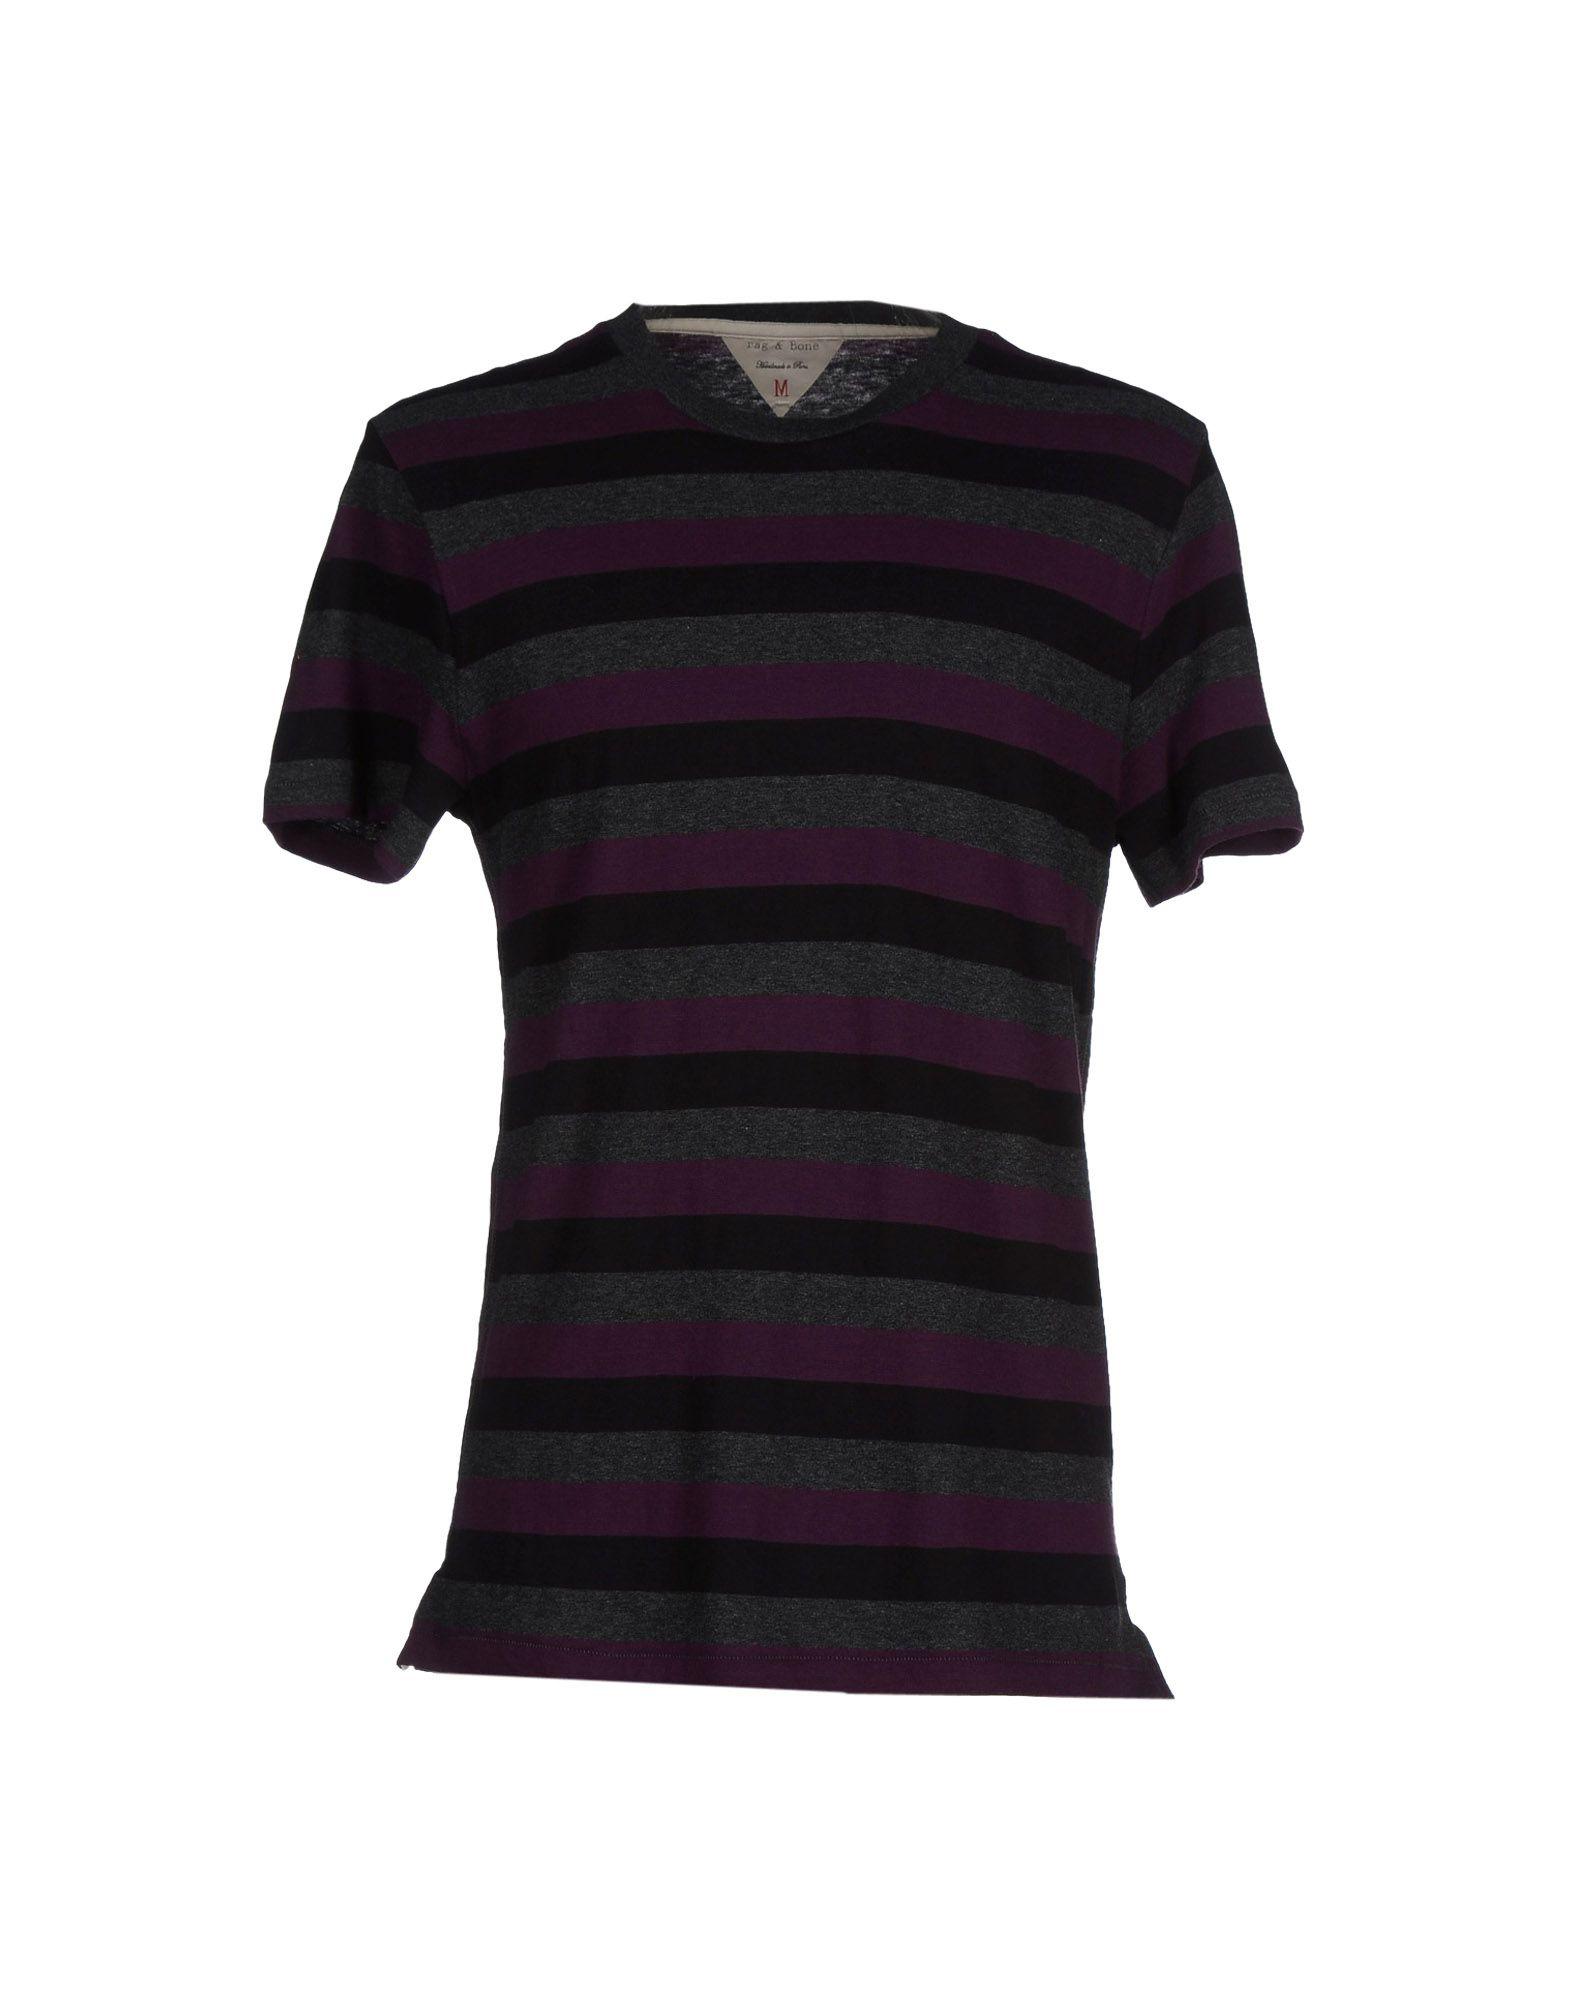 Lyst rag bone t shirt in purple for men for Rag and bone t shirts